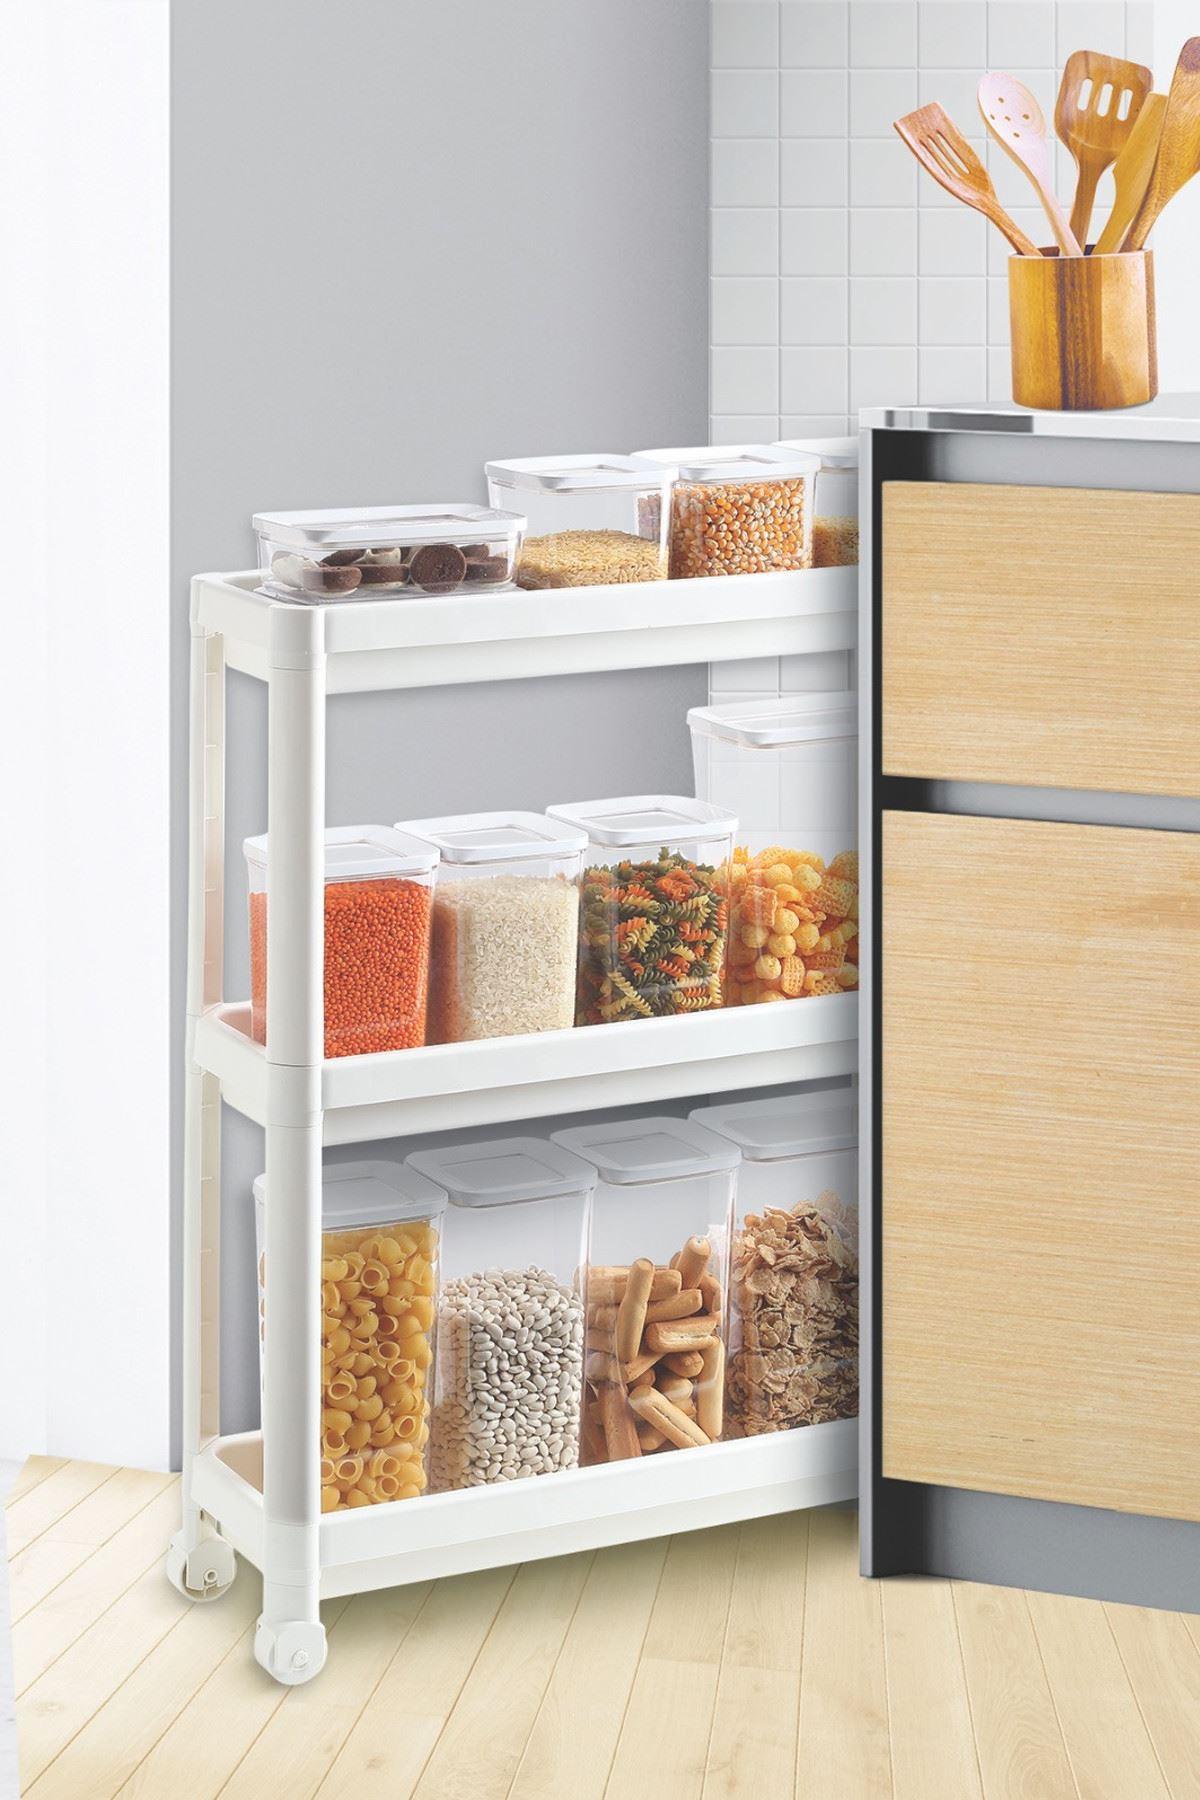 Kitchen Trend Beyaz Çok Amaçlı Tekerlekli Raf Mutfak Raf Plastik Raf Banyo Raf